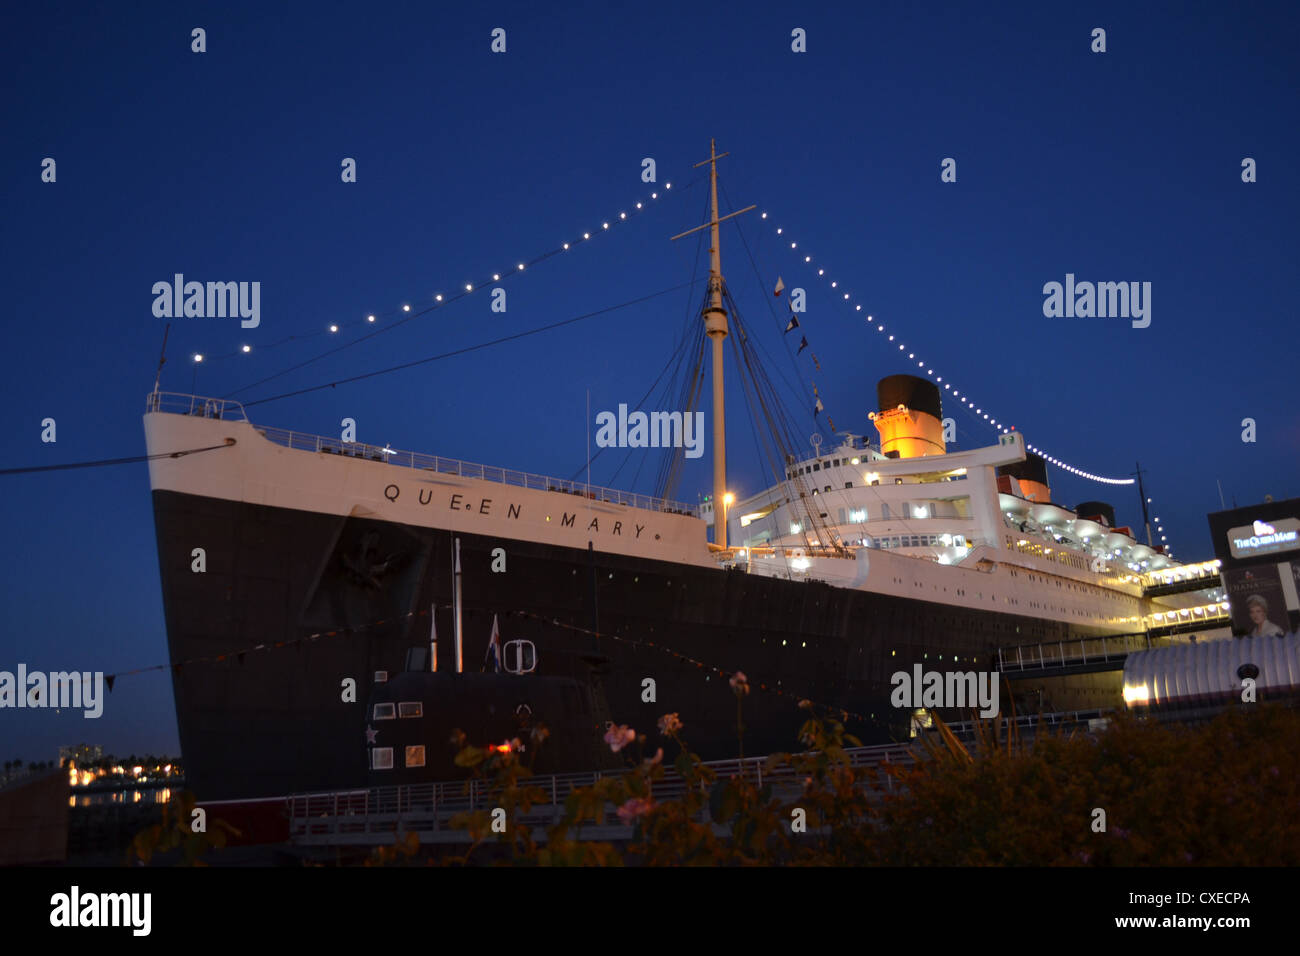 RMS Queen Mary at Long Beach, California - Stock Image